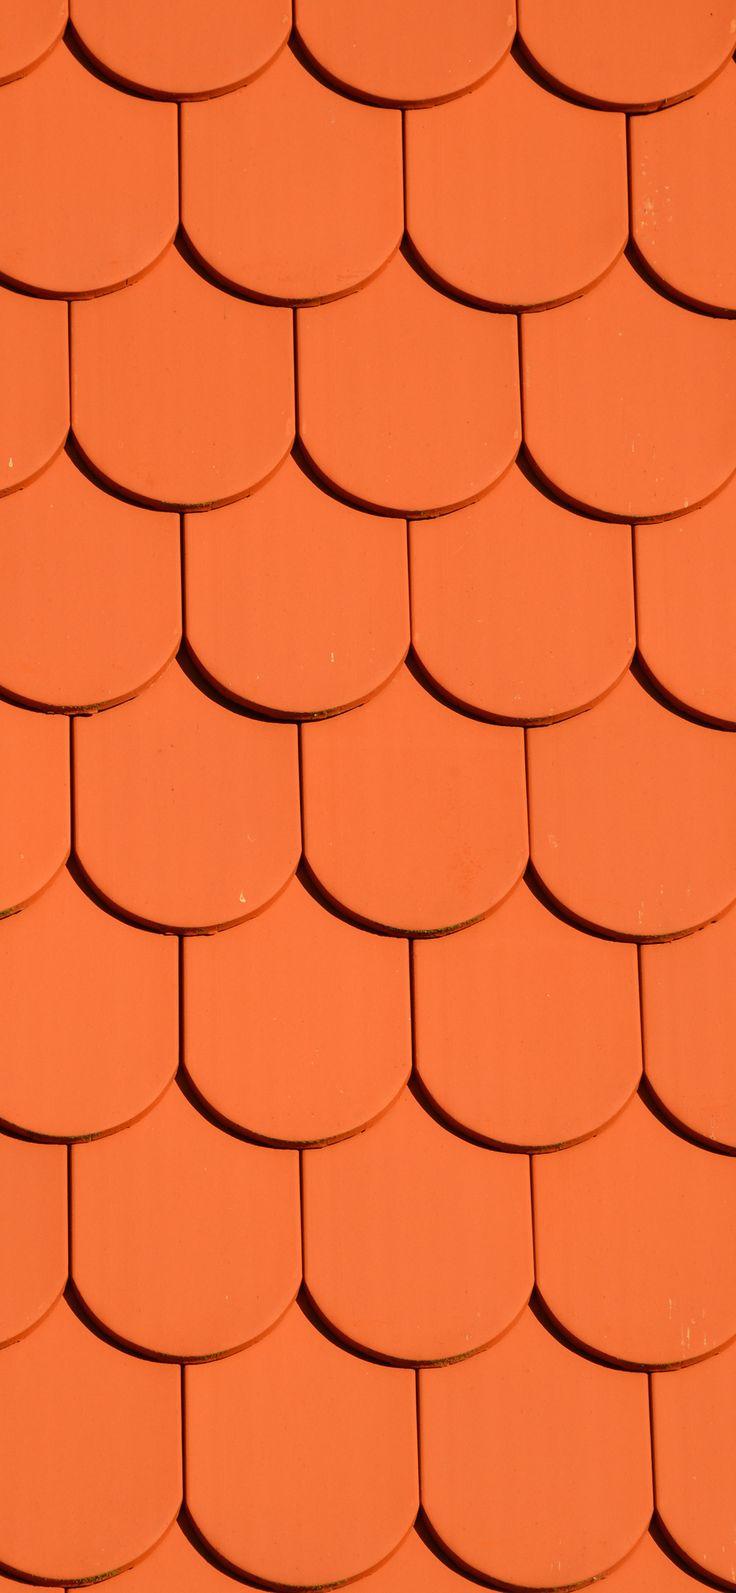 wb10-brick-wall-orange-pattern-background via iPhoneXpapers.com - Wallpapers for... wb10-brick-wall-orange-pattern-background via <a href=